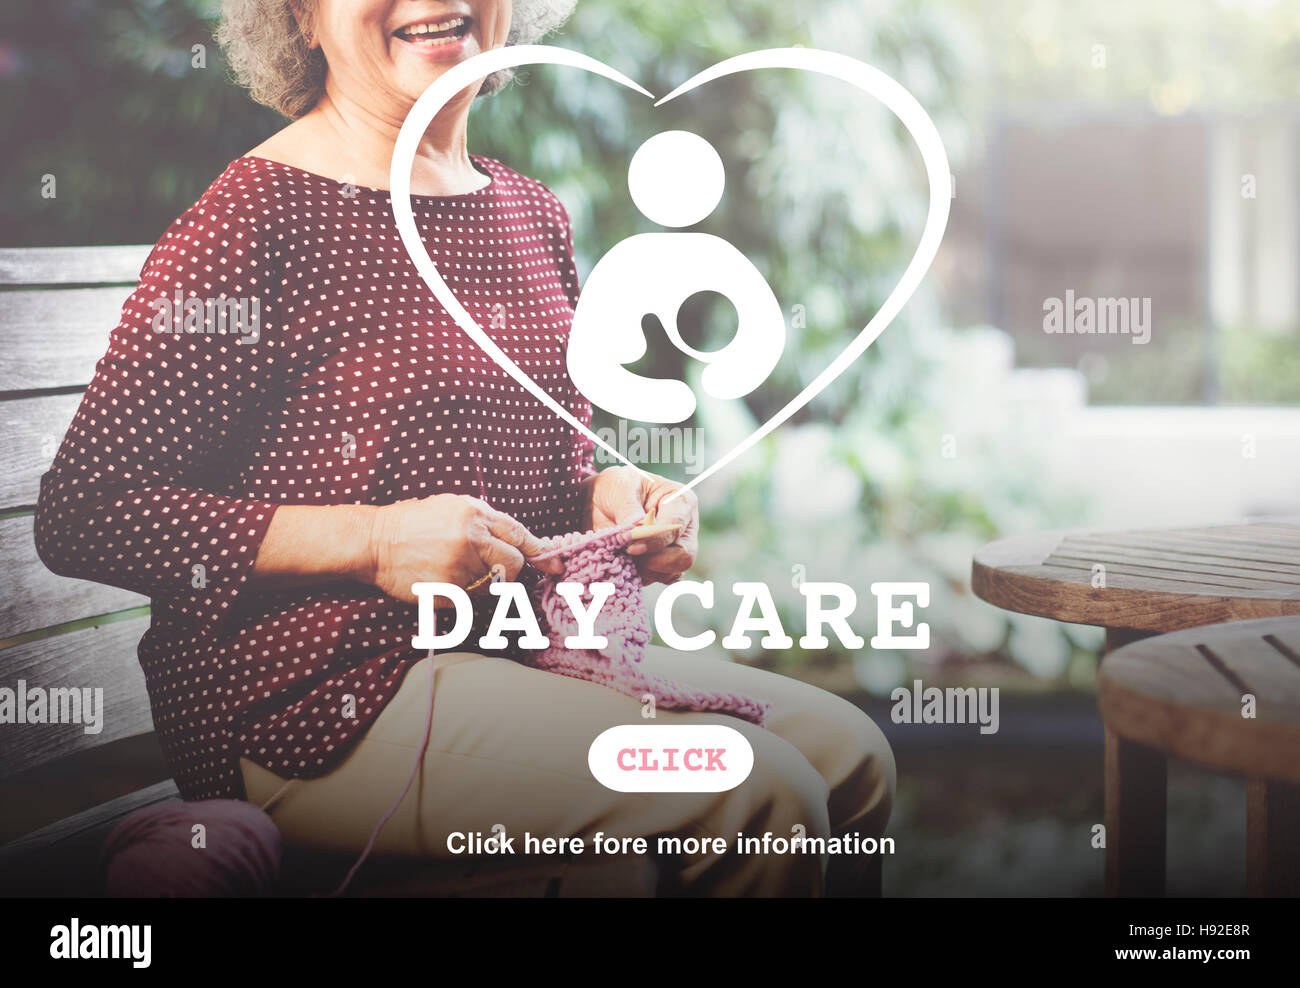 Day Care Babysitter Nanny Nursery Love Motherhood Concept - Stock Image